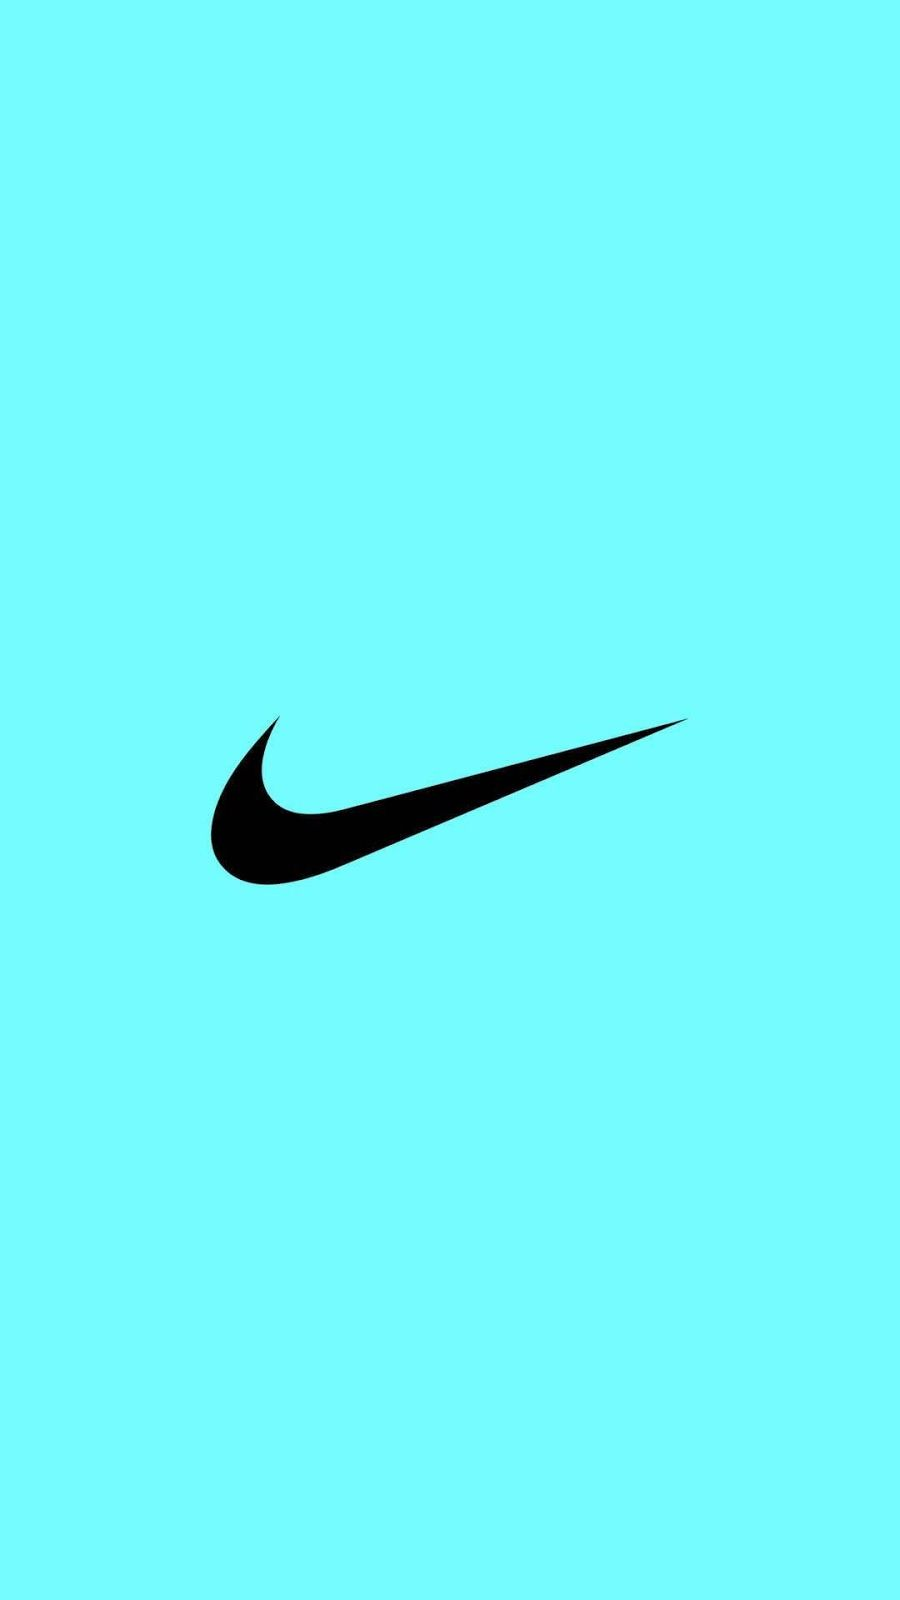 Nike Iphone Wallpapers Hd In 2020 Nike Wallpaper Iphone Nike Wallpaper Adidas Wallpapers